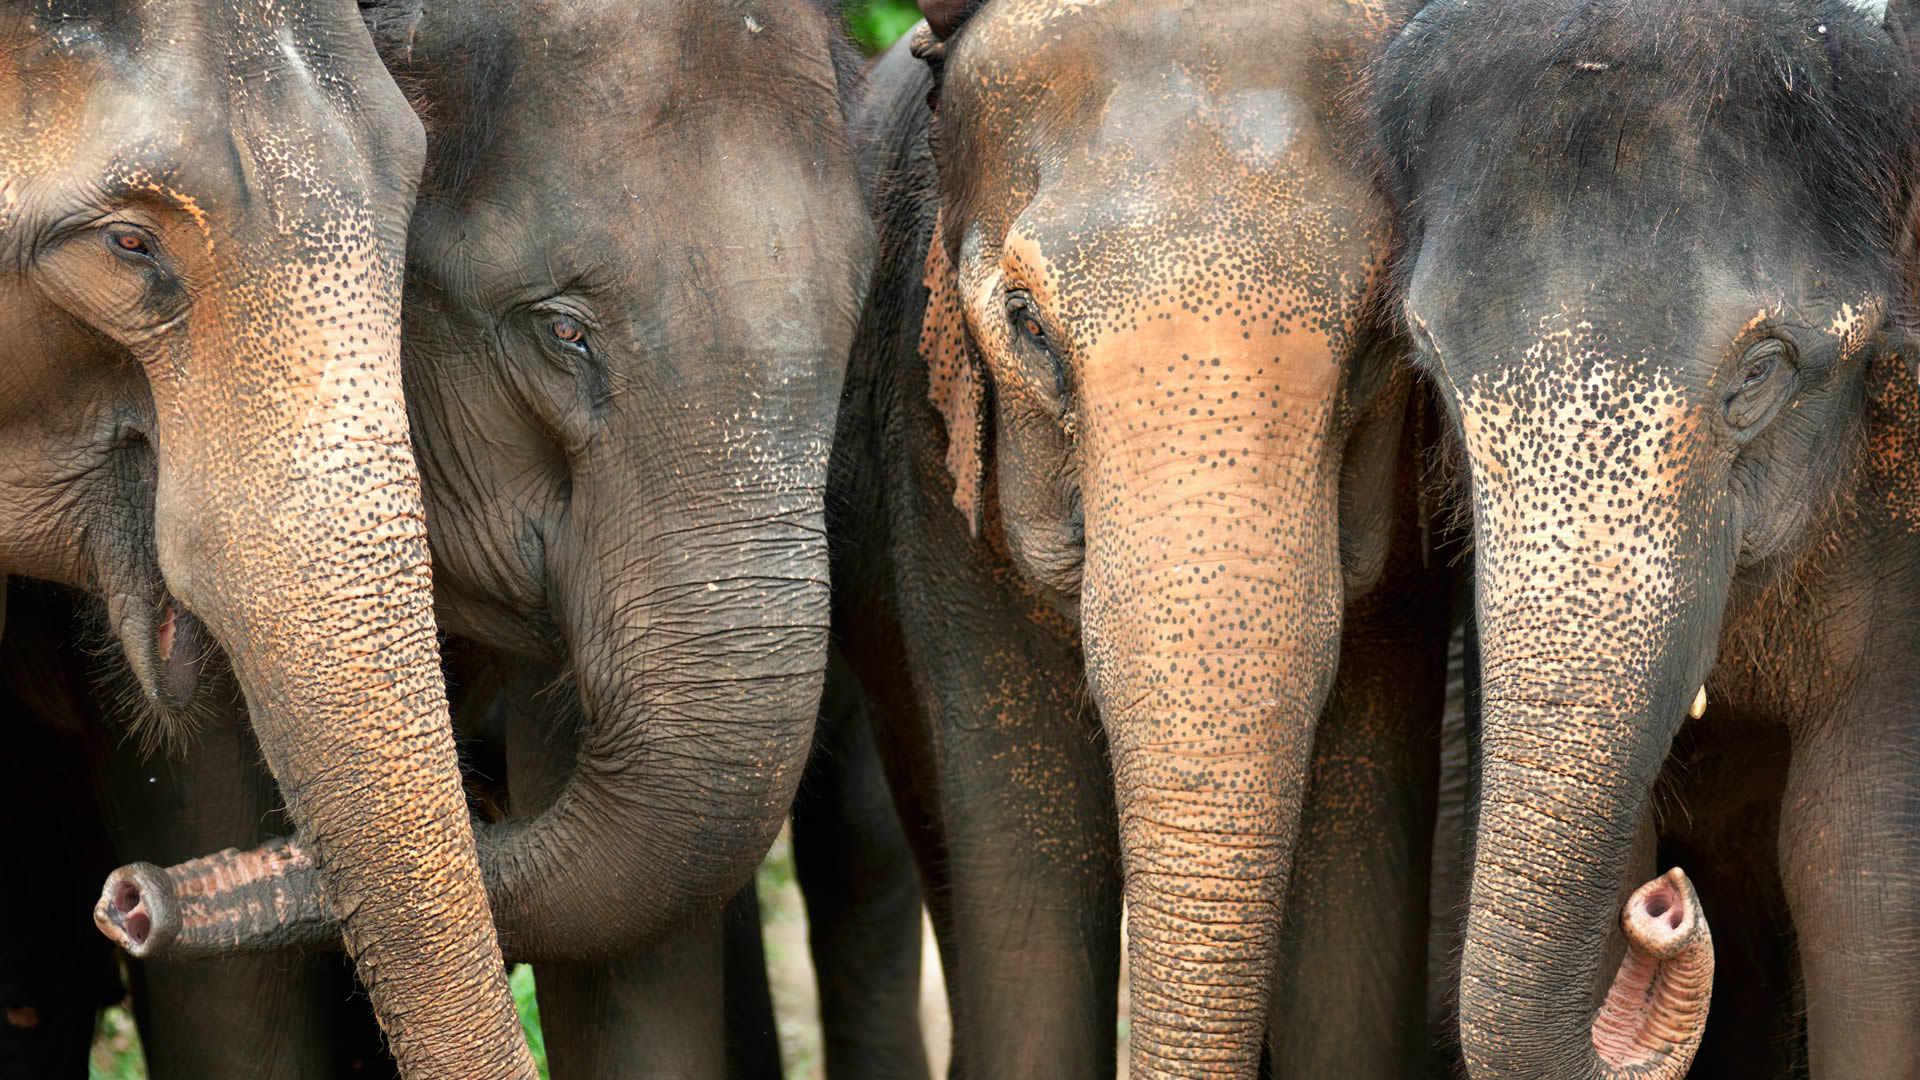 d2c588353e0e Volunteer Work With Elephants in Thailand s Elephant Sanctuary